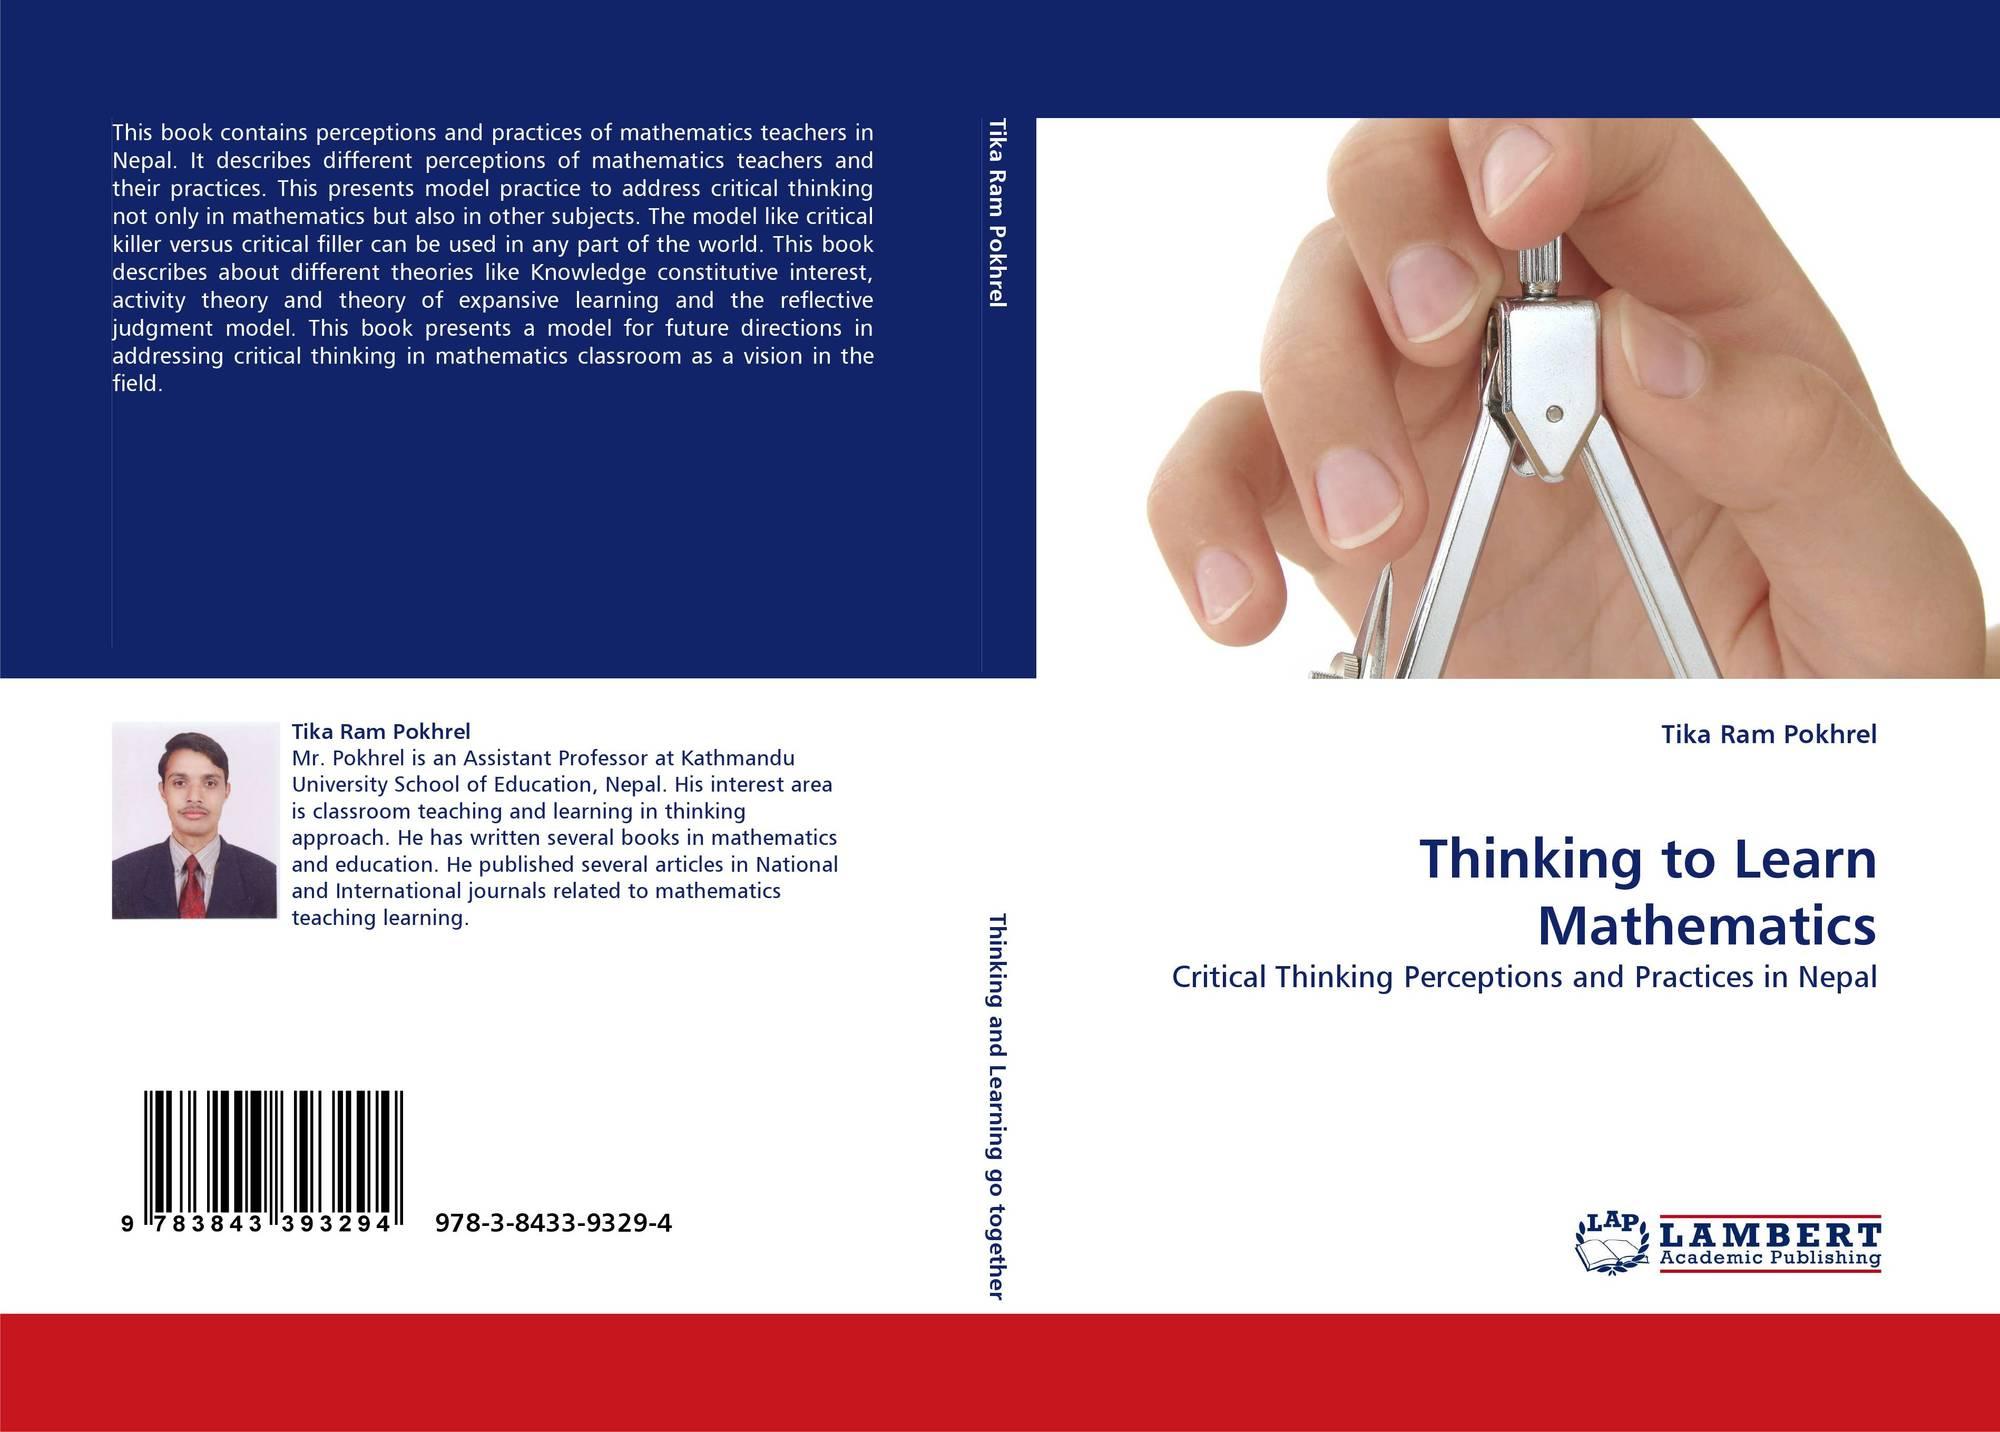 Thinking to Learn Mathematics, 978-3-8433-9329-4, 384339329X